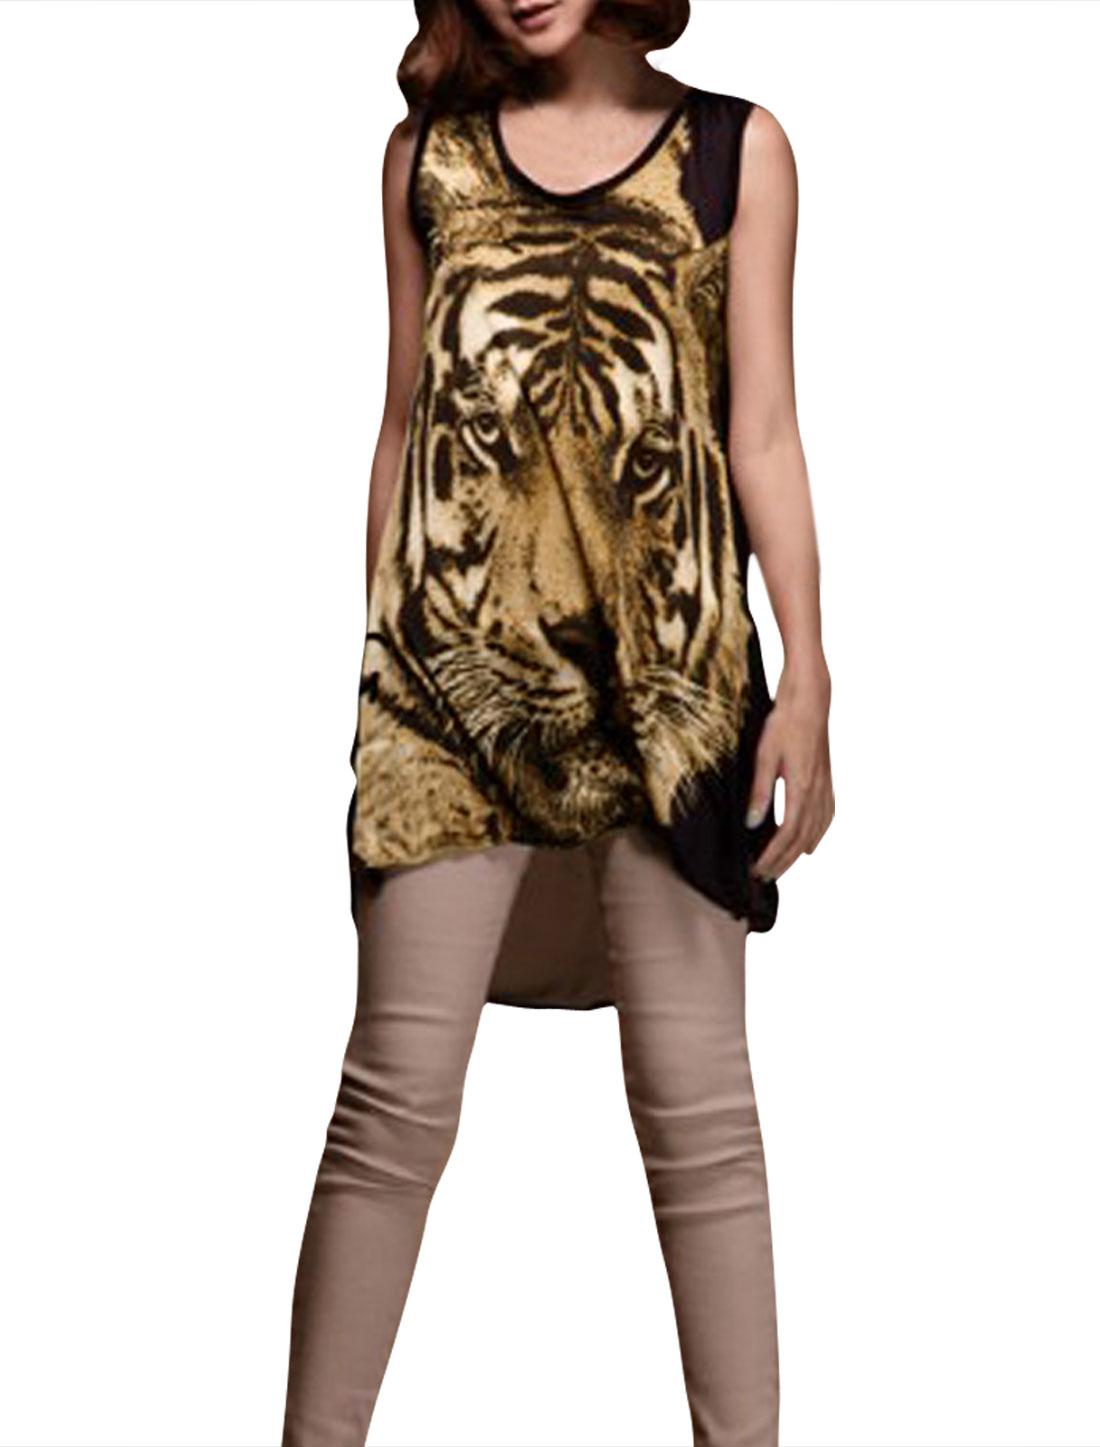 Ladies Khaki Sleeveless Scoop Neck Tiger Print Shirt XS